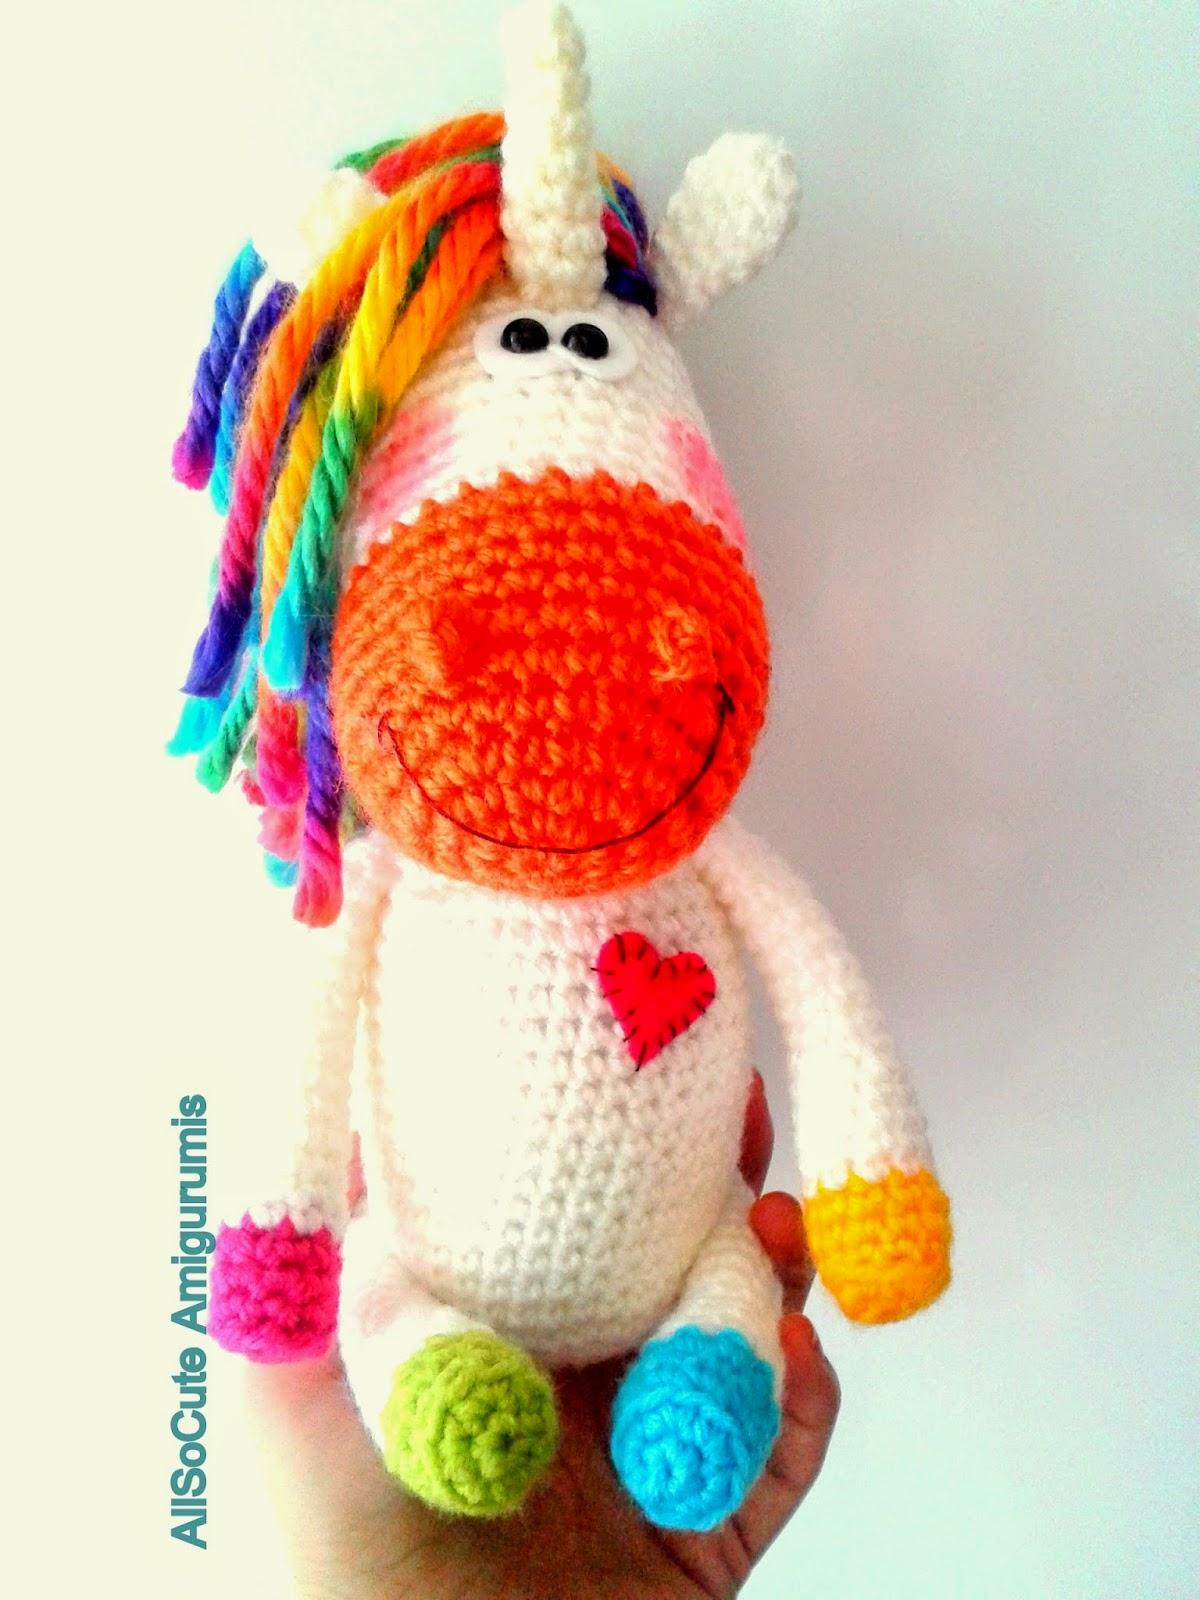 Ponytail Amigurumi : AllSoCute Amigurumis: Amigurumi Pony, Crochet Pony, Horse ...